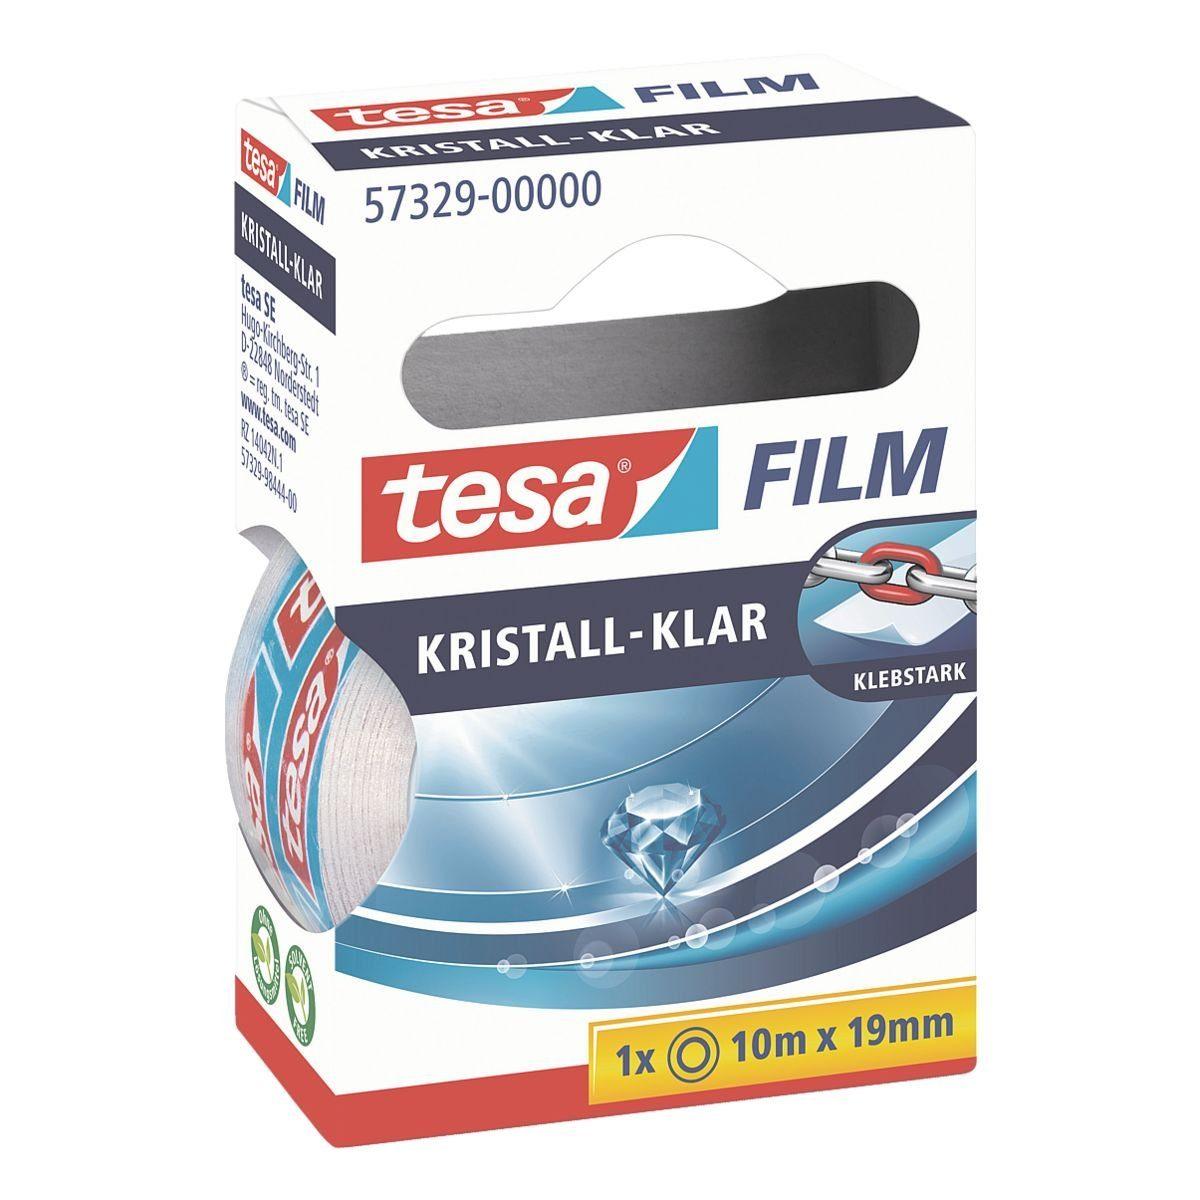 Tesa Klebeband »kristall-klar«